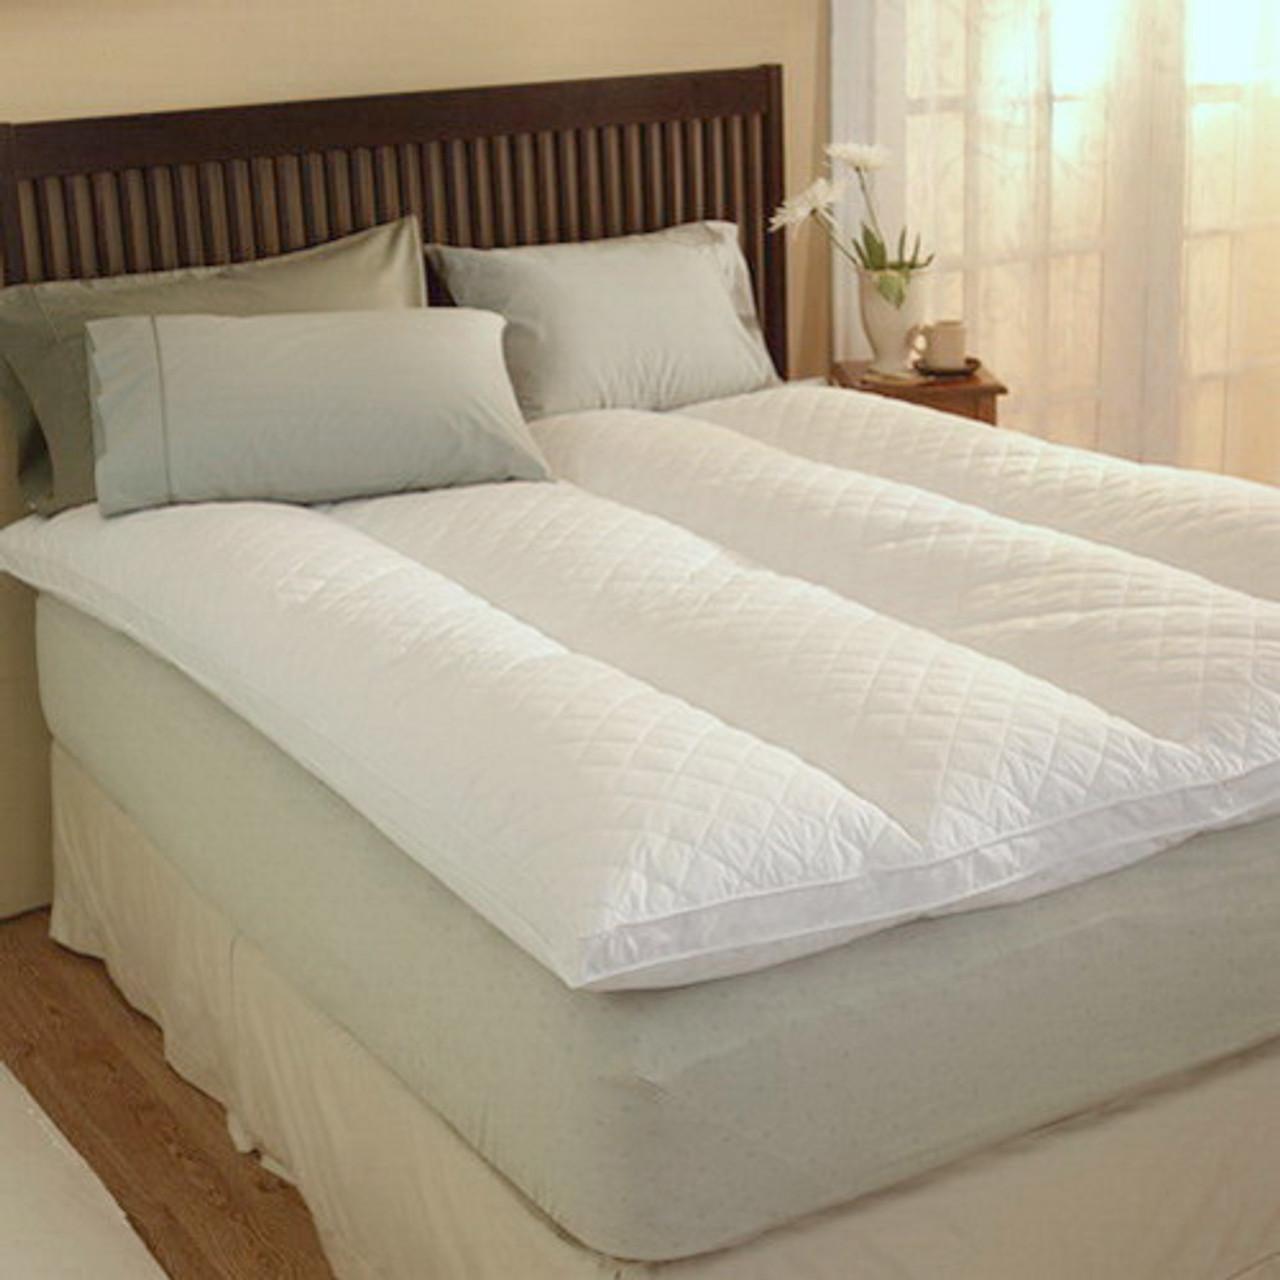 blankets com